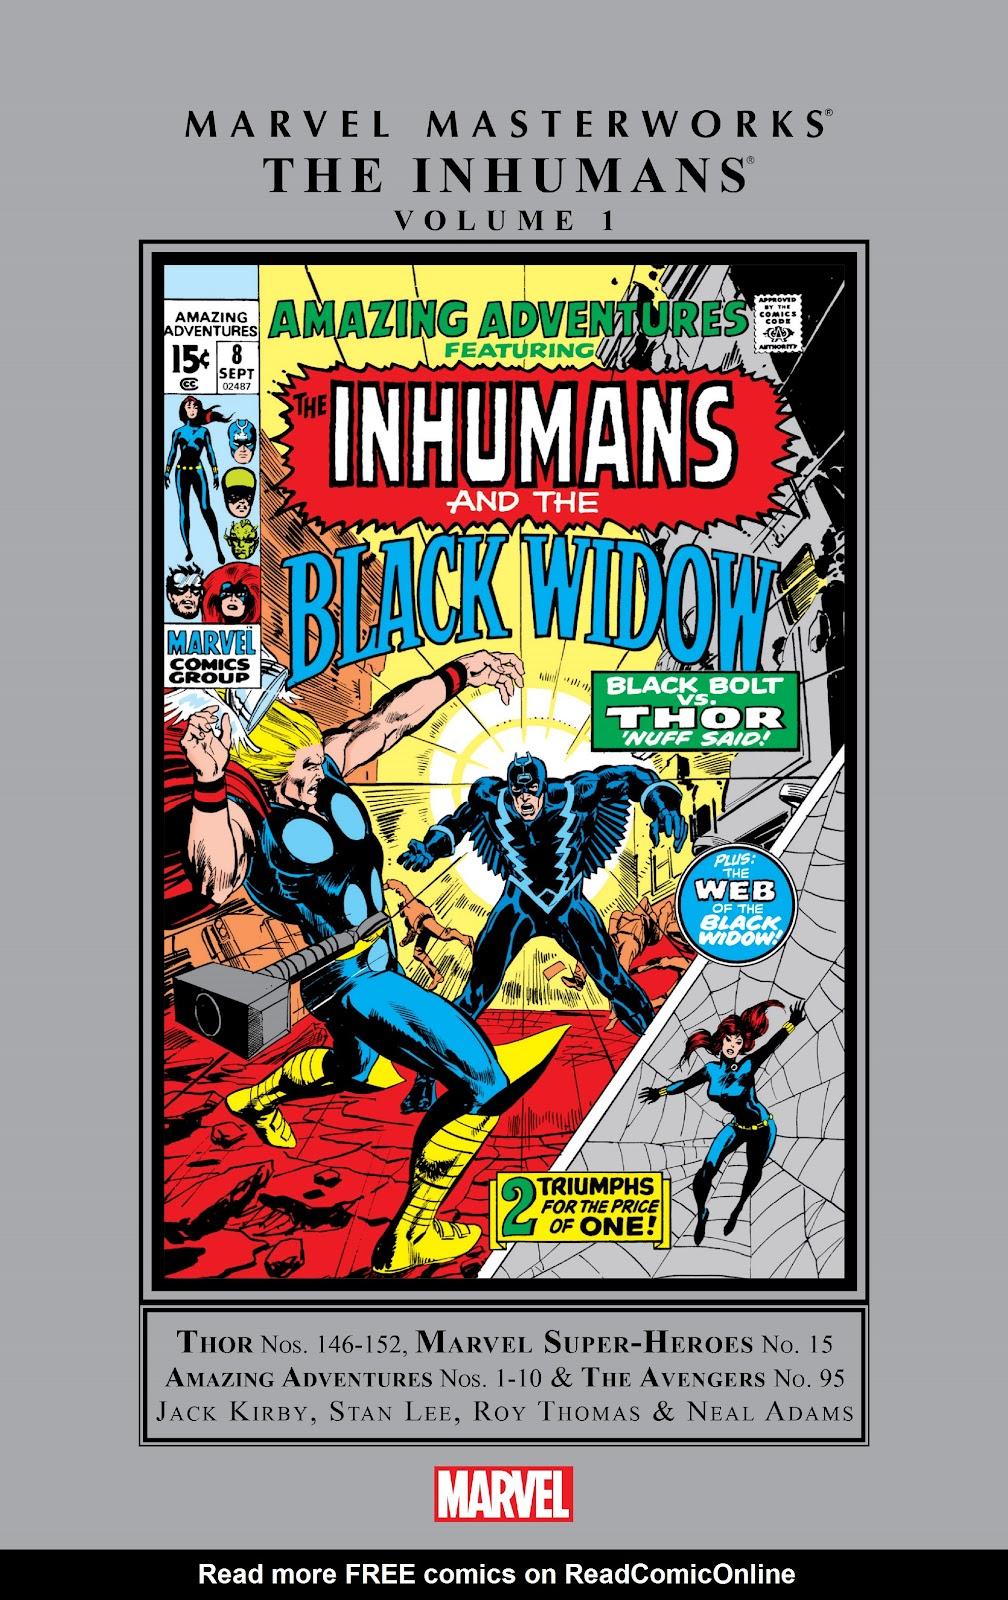 Read online Marvel Masterworks: The Inhumans comic -  Issue # TPB 1 (Part 1) - 1